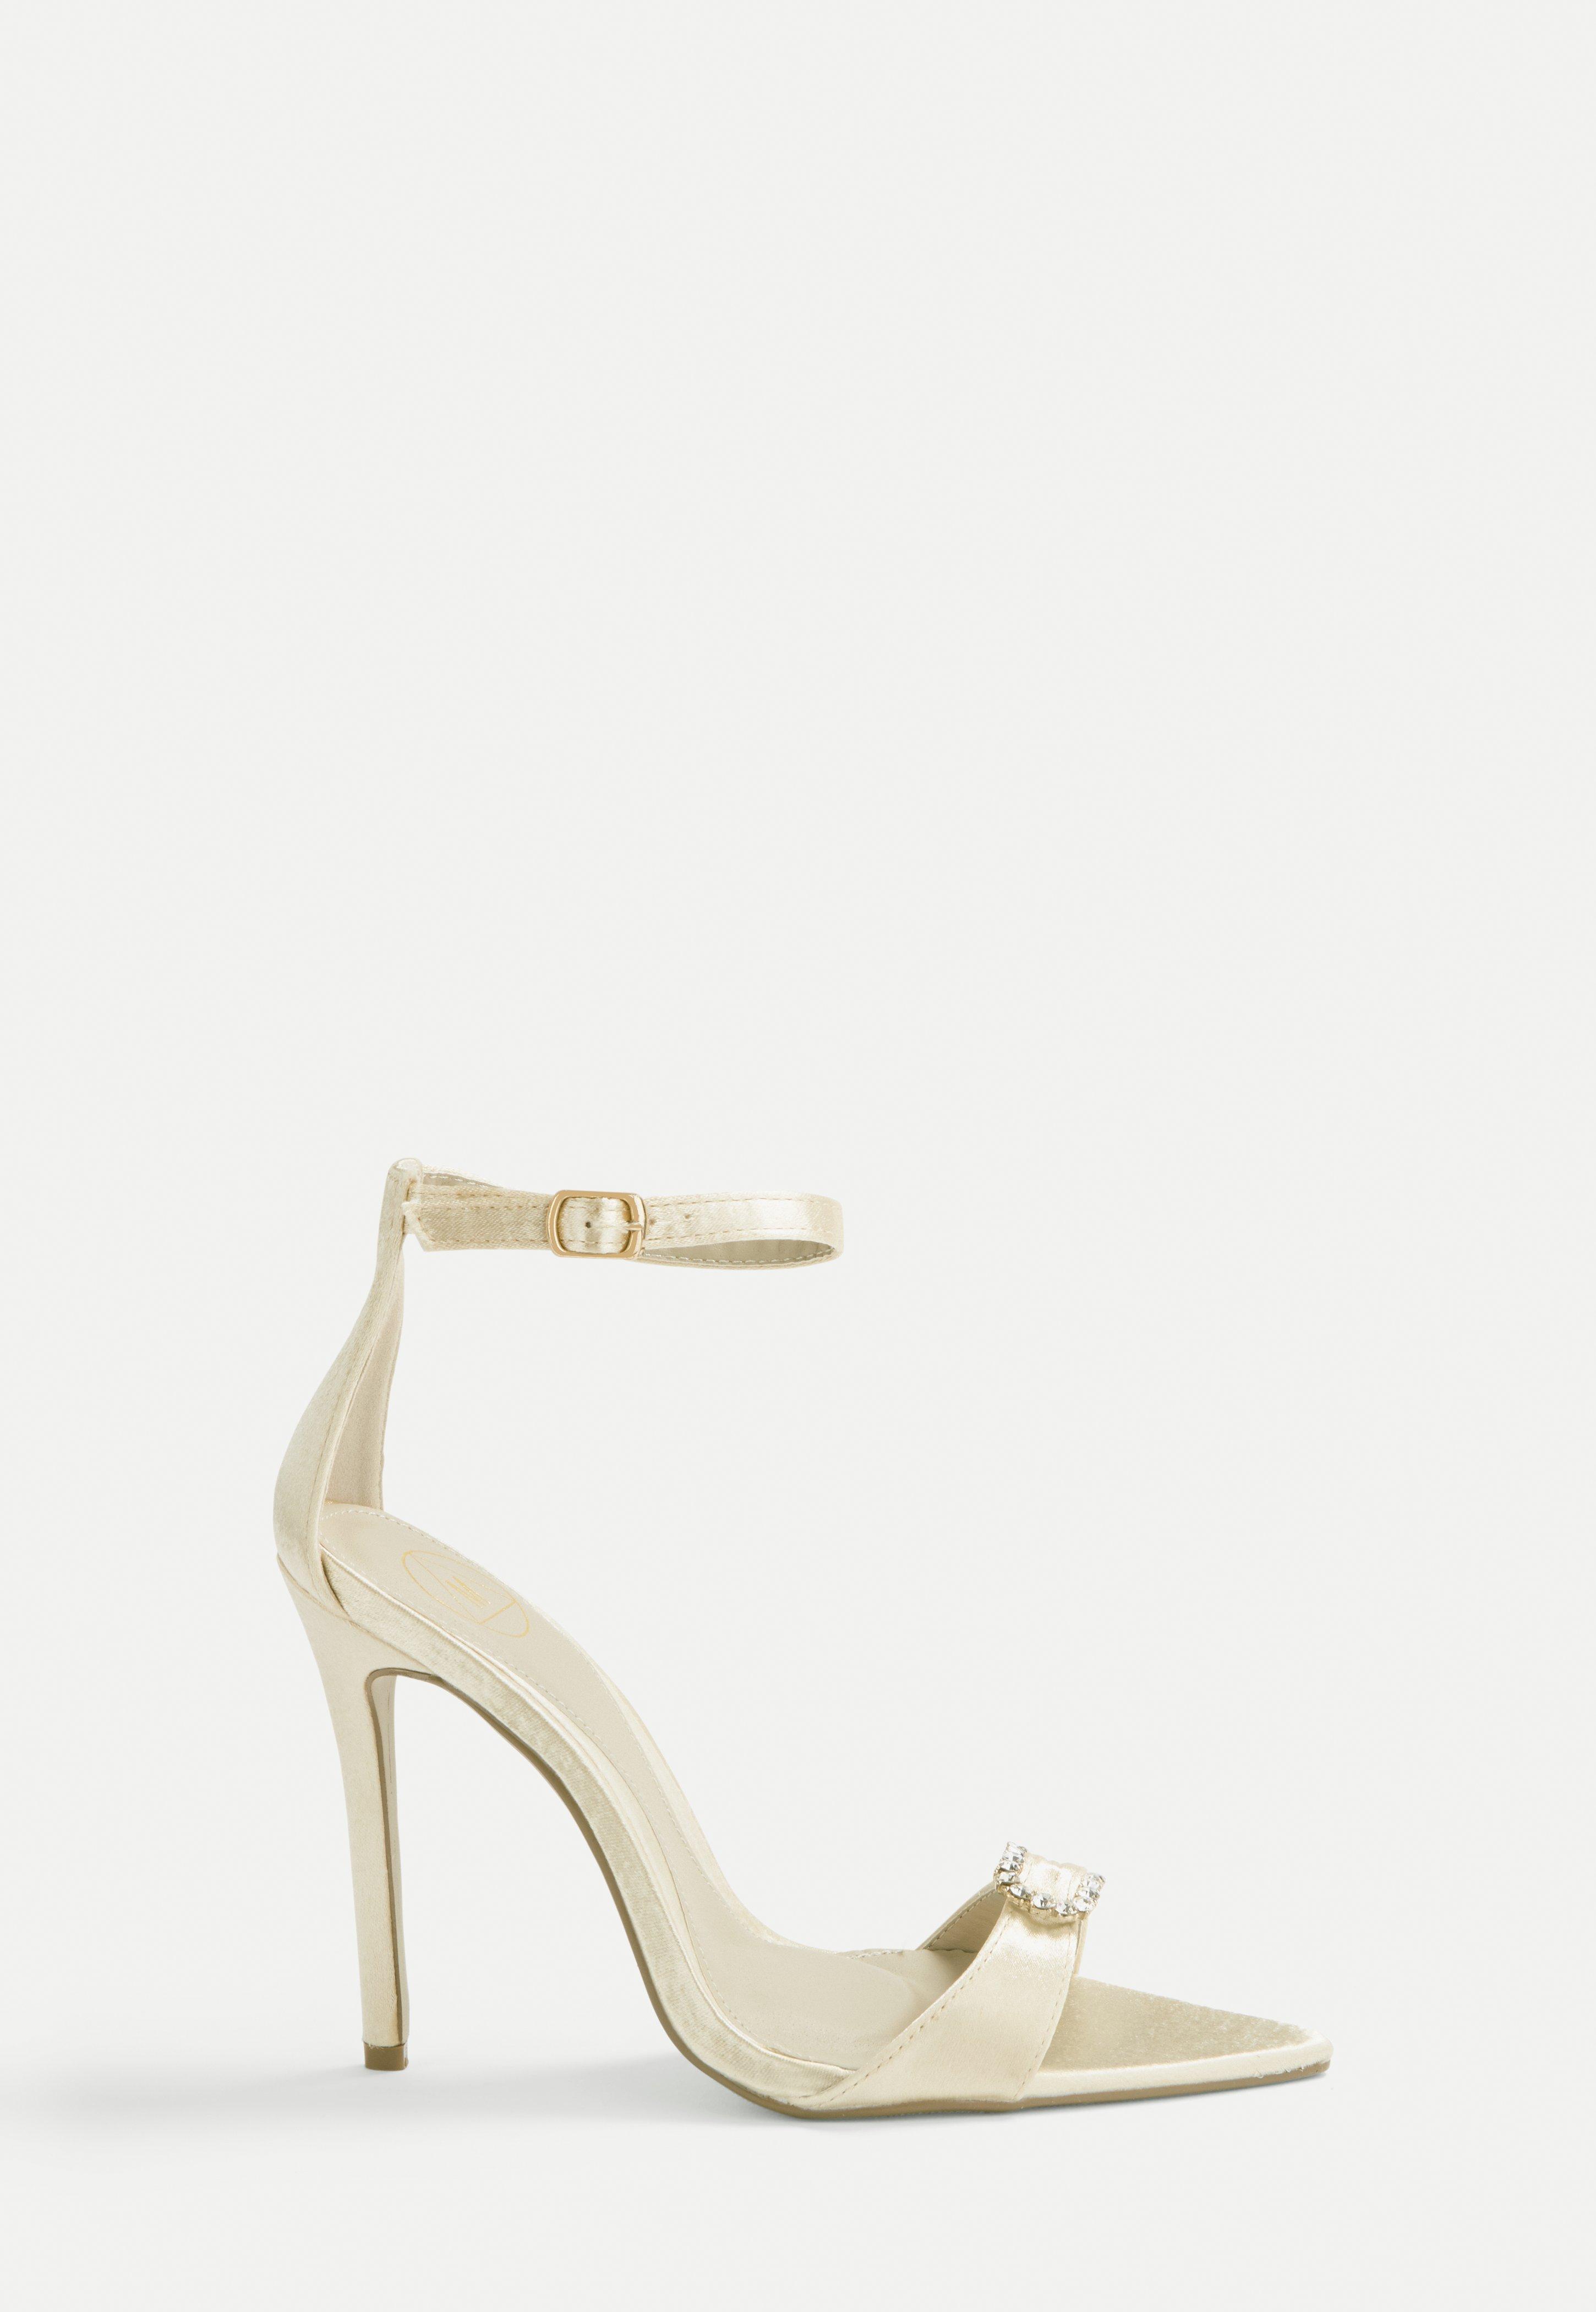 Nude Satin Diamante Heeled Sandals